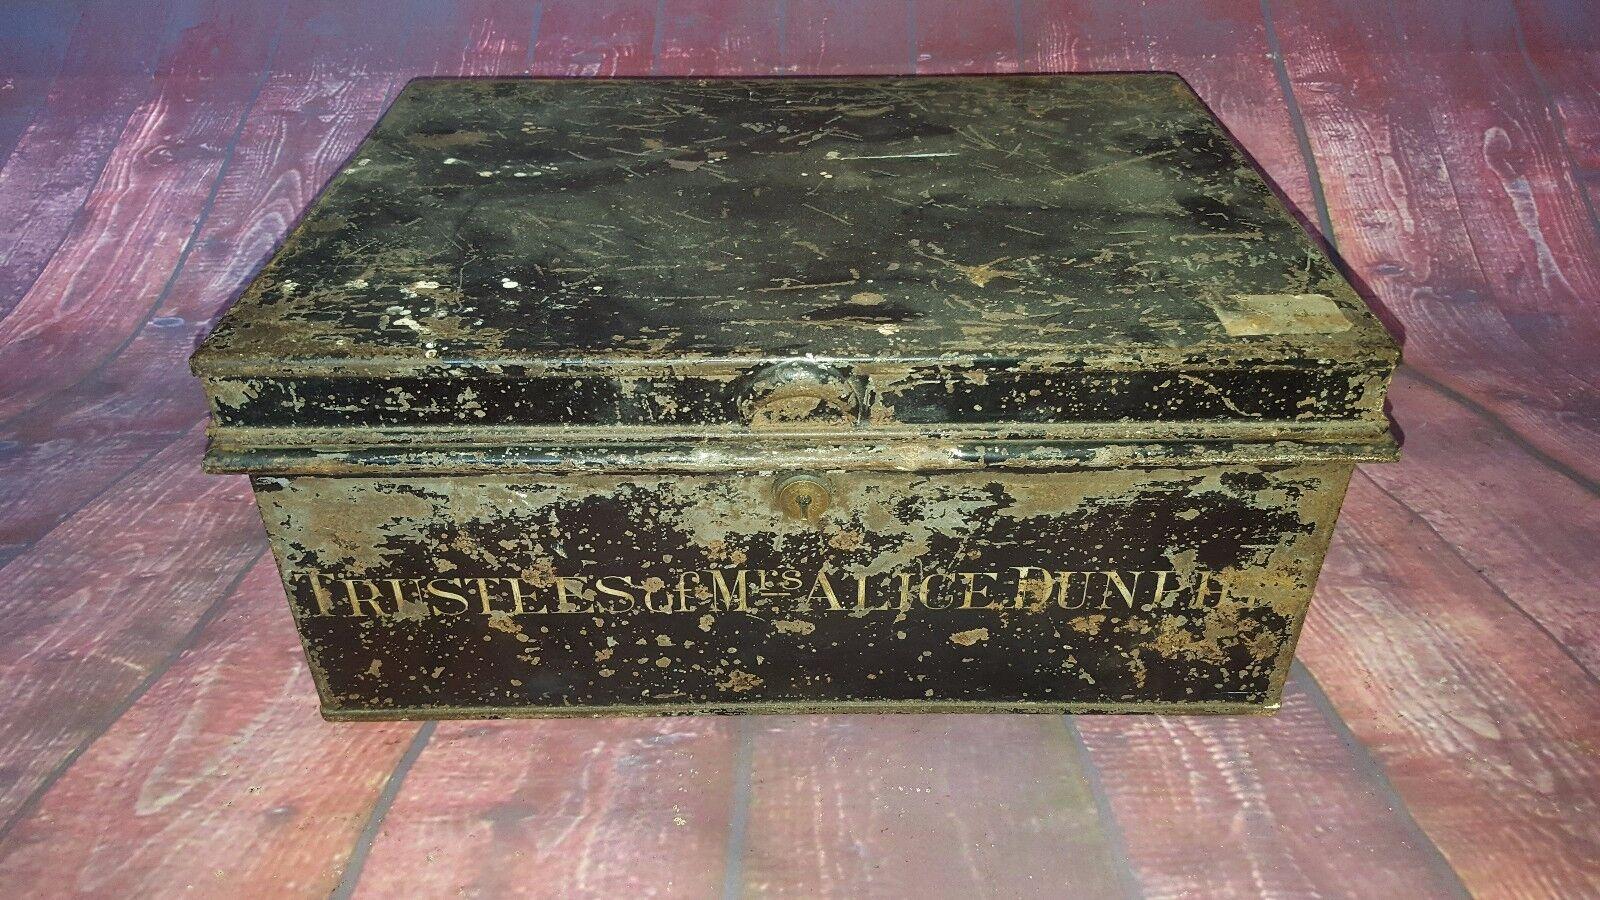 Vintage Metal Deed Document Box Storage Display Money Box Handles Prop